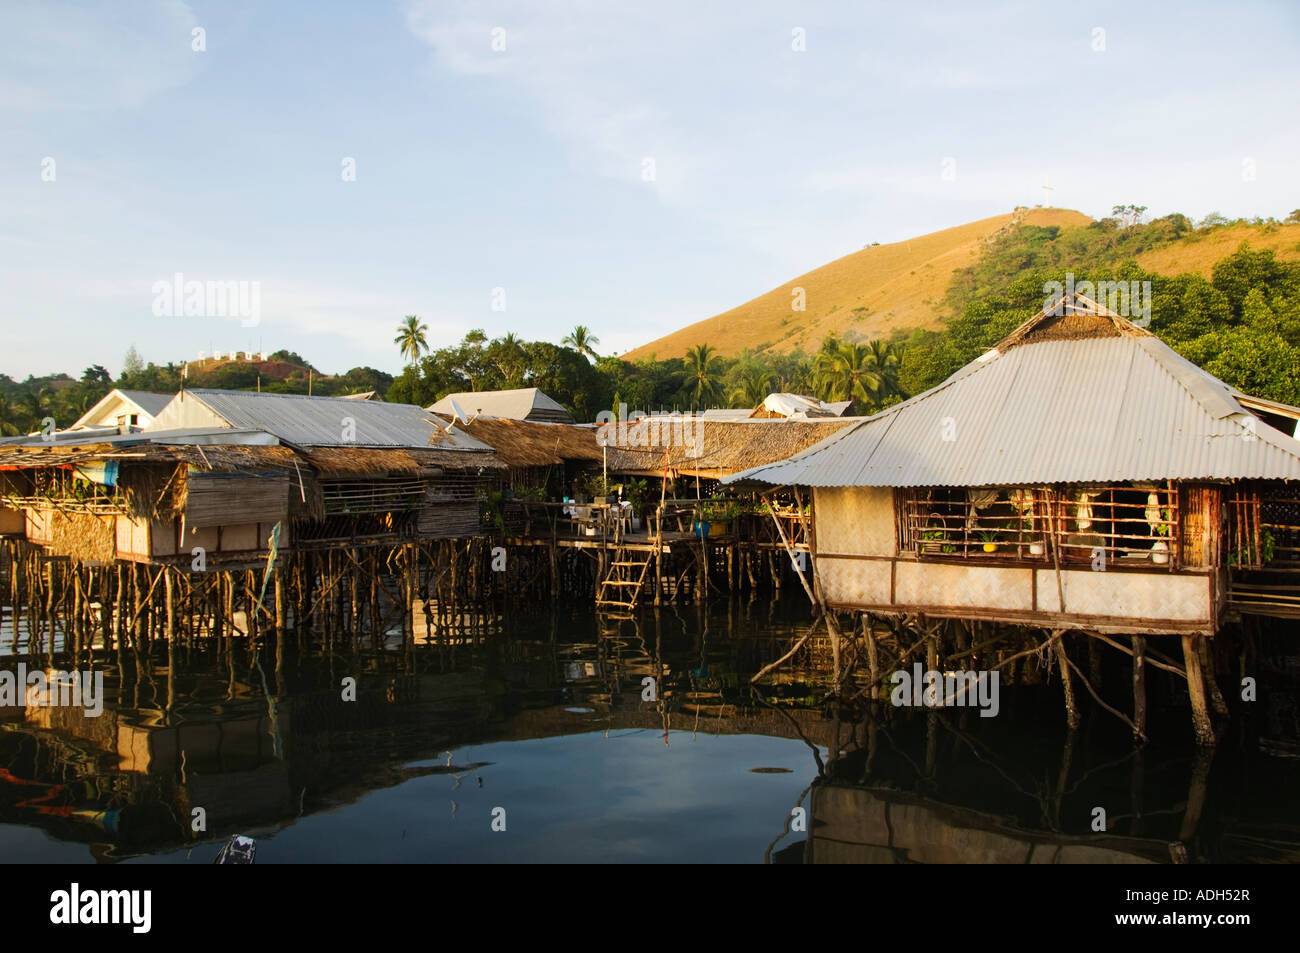 Philippines Palawan Province Coron Island Stock Photos & Philippines ...